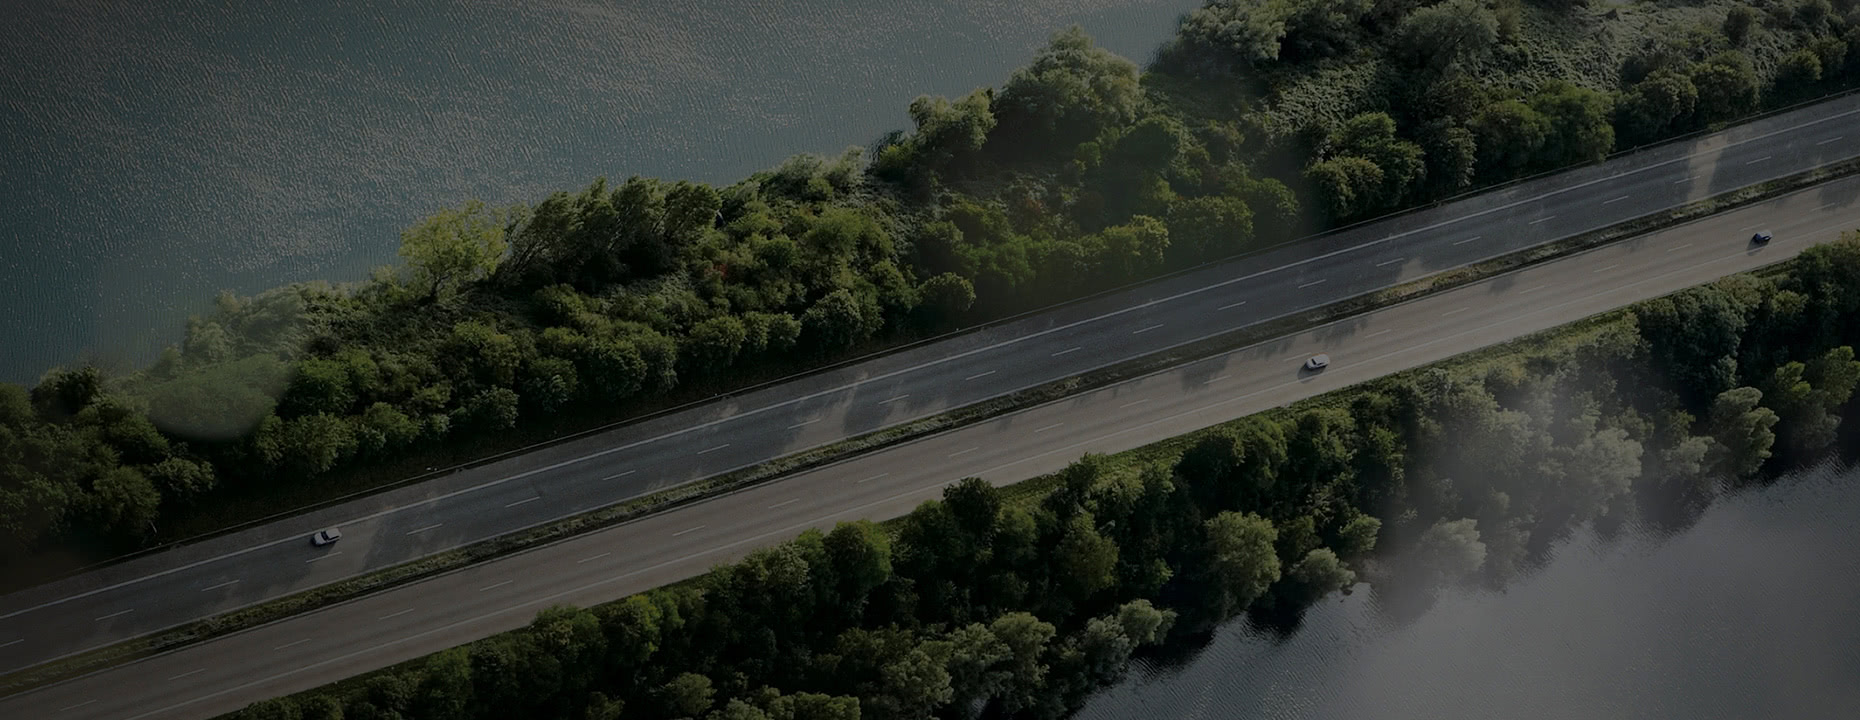 Hyundai Palisade та концепт Le Fil Rouge здобули премії iF Design Awards-2019 | Автопалац Тернопіль - фото 8